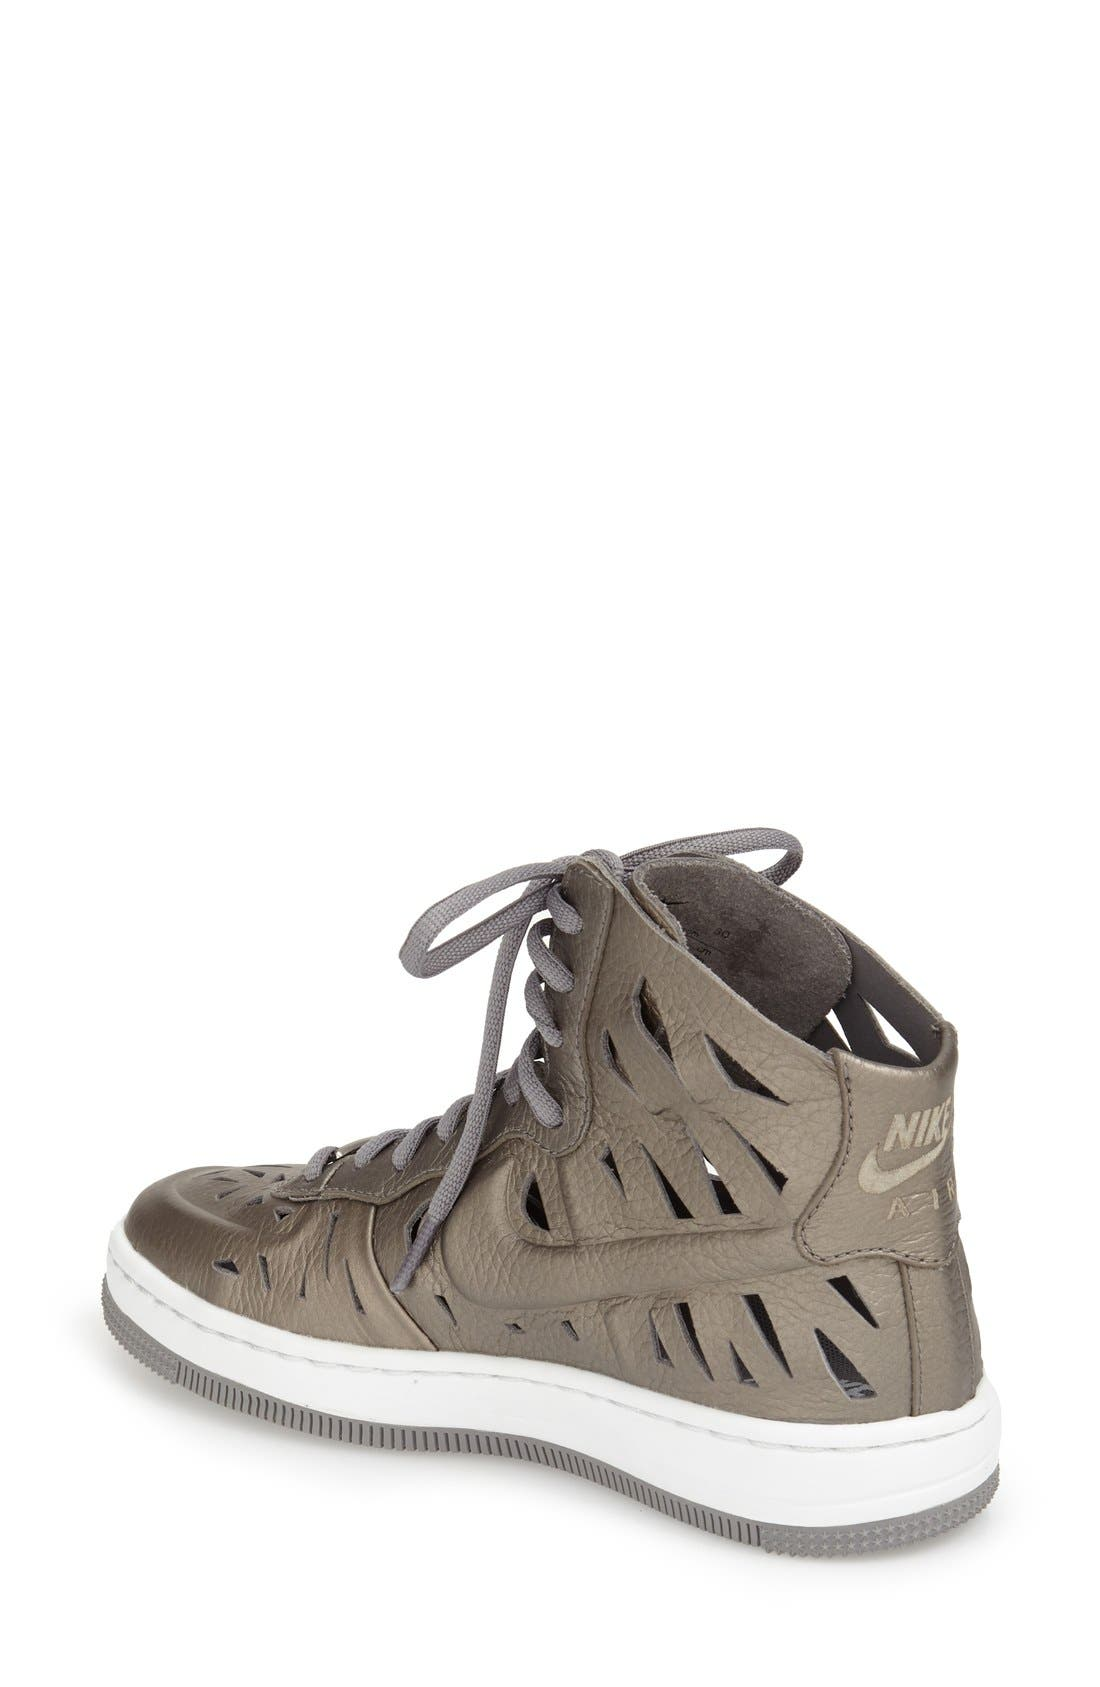 Alternate Image 2  - Nike 'Air Force 1 - Ultra Force Joli' High Top Sneaker (Women)